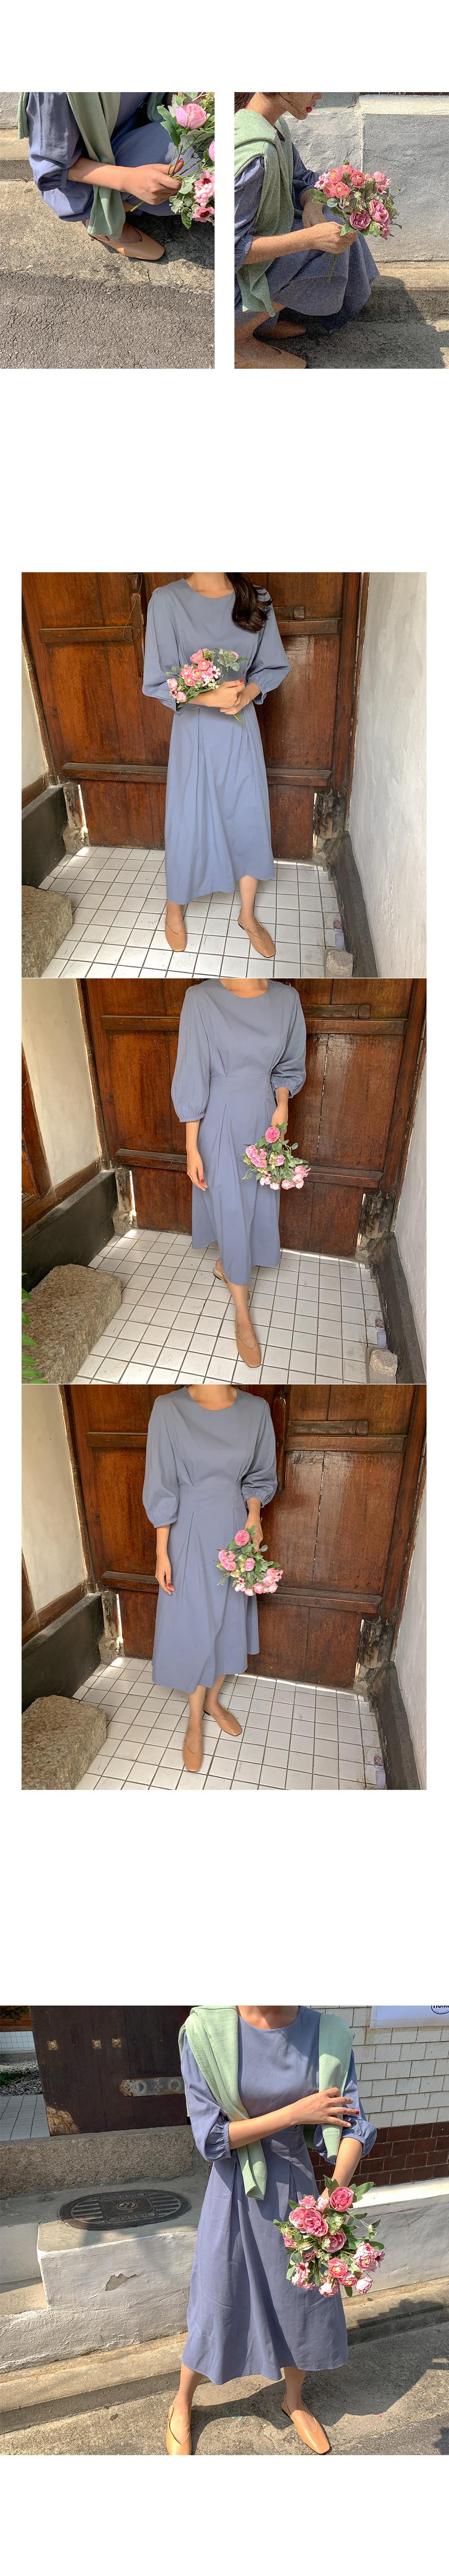 Mina Pintuck Dress